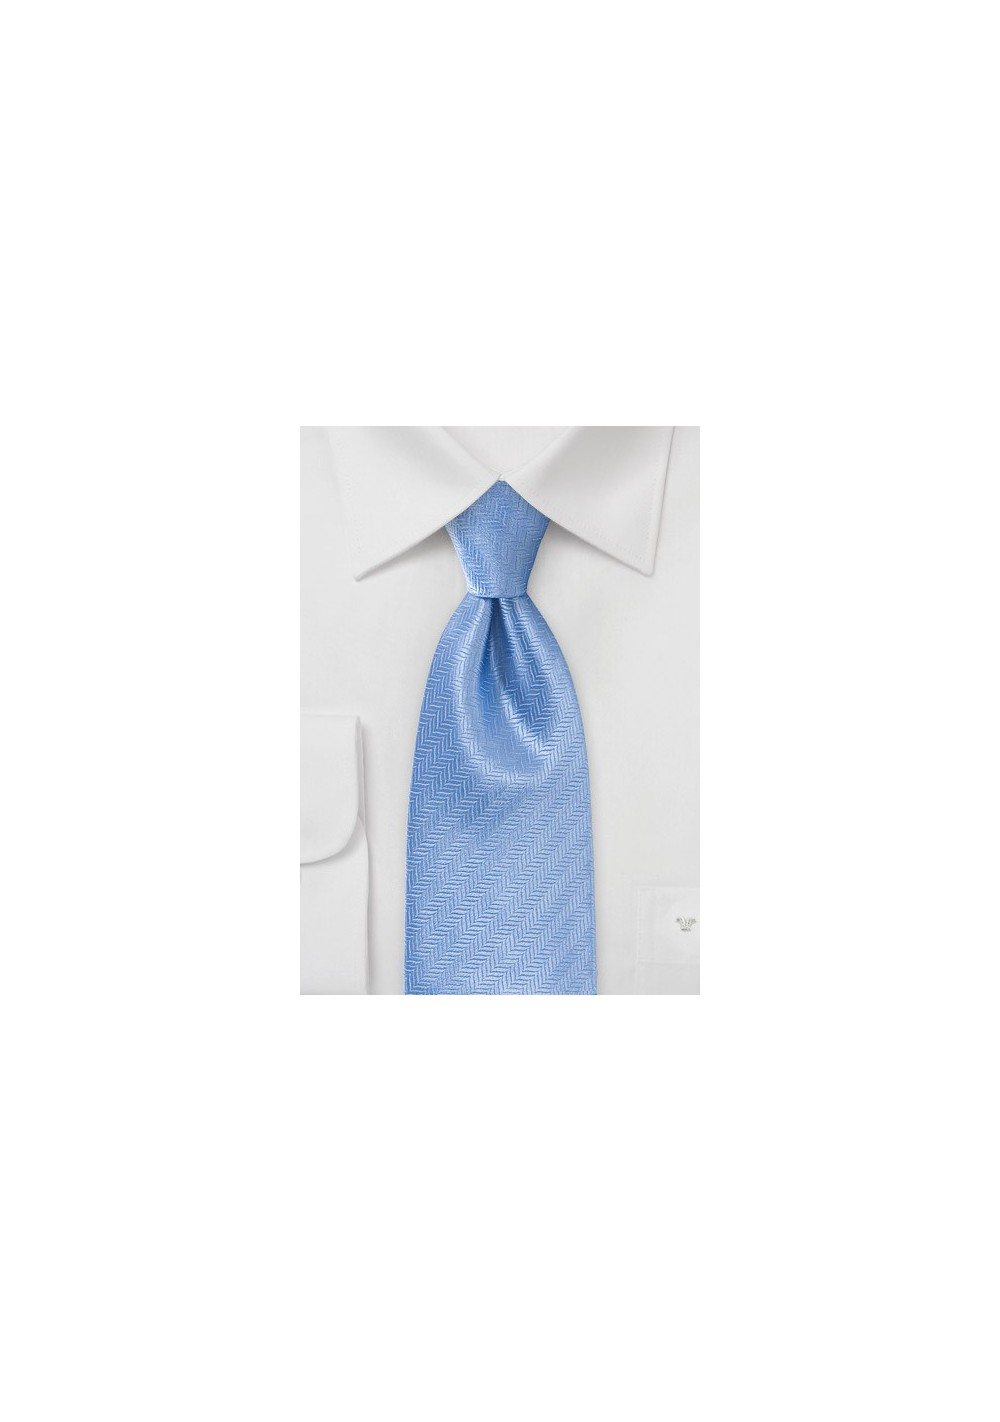 Feather Patterned Tie In Cornflower Blue